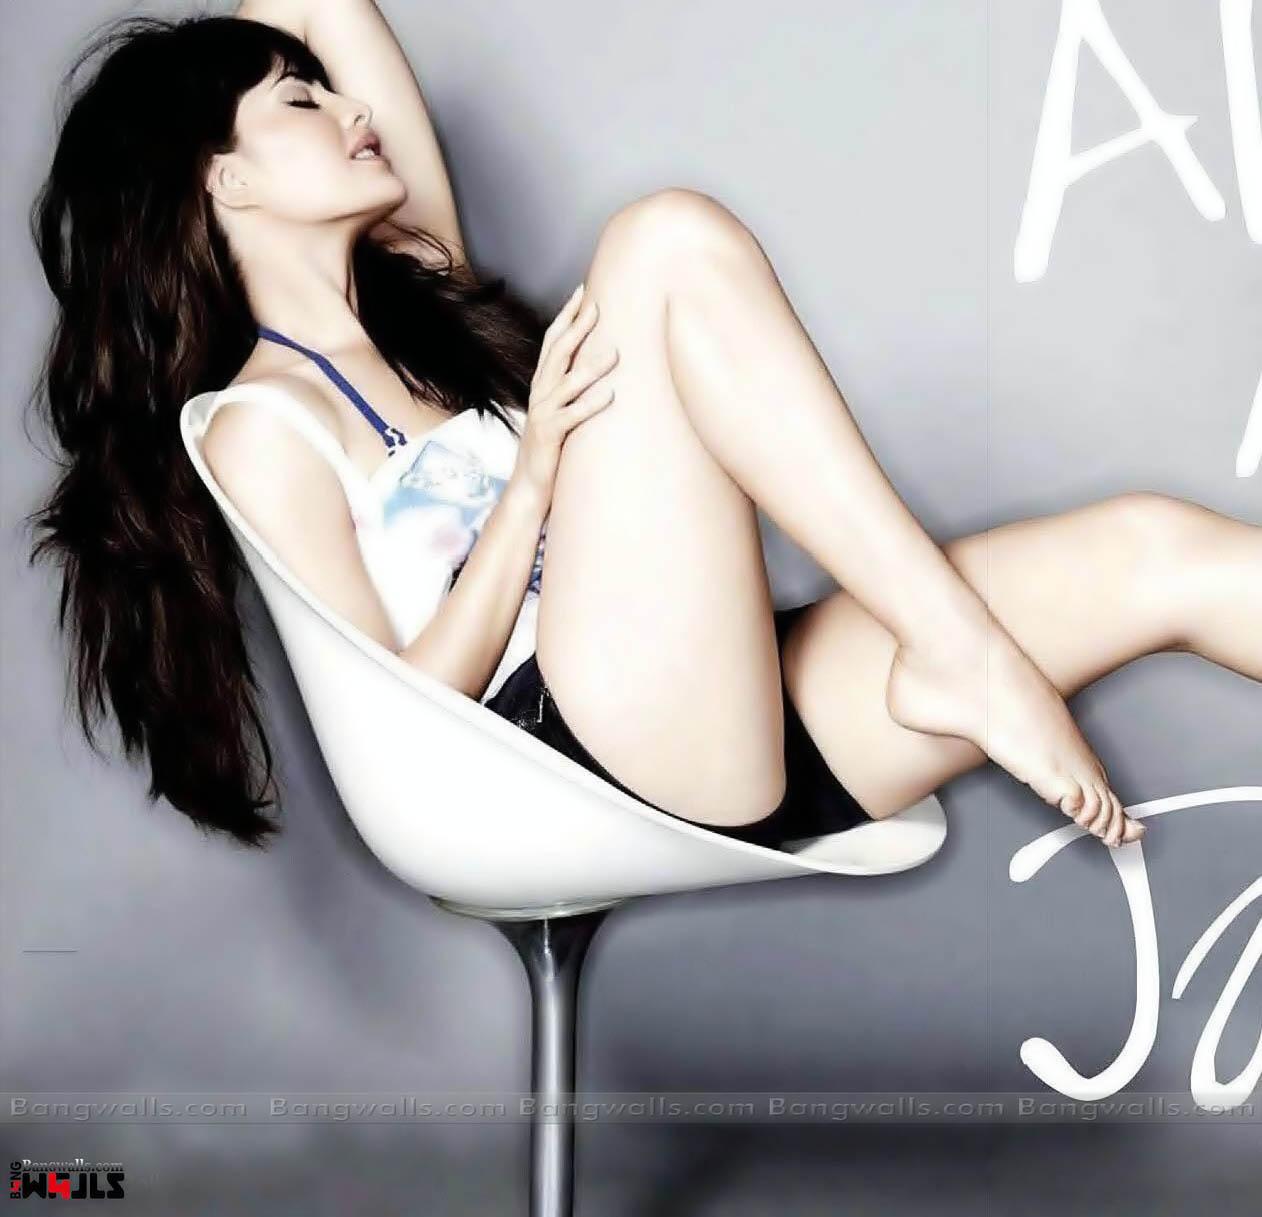 http://1.bp.blogspot.com/-AXul9RCCA-M/Tpe80fO3u9I/AAAAAAAAAmU/YFjGA70LdUY/s1600/Jacqueline+Fernandez+Sexy+Sitting+Style.jpg